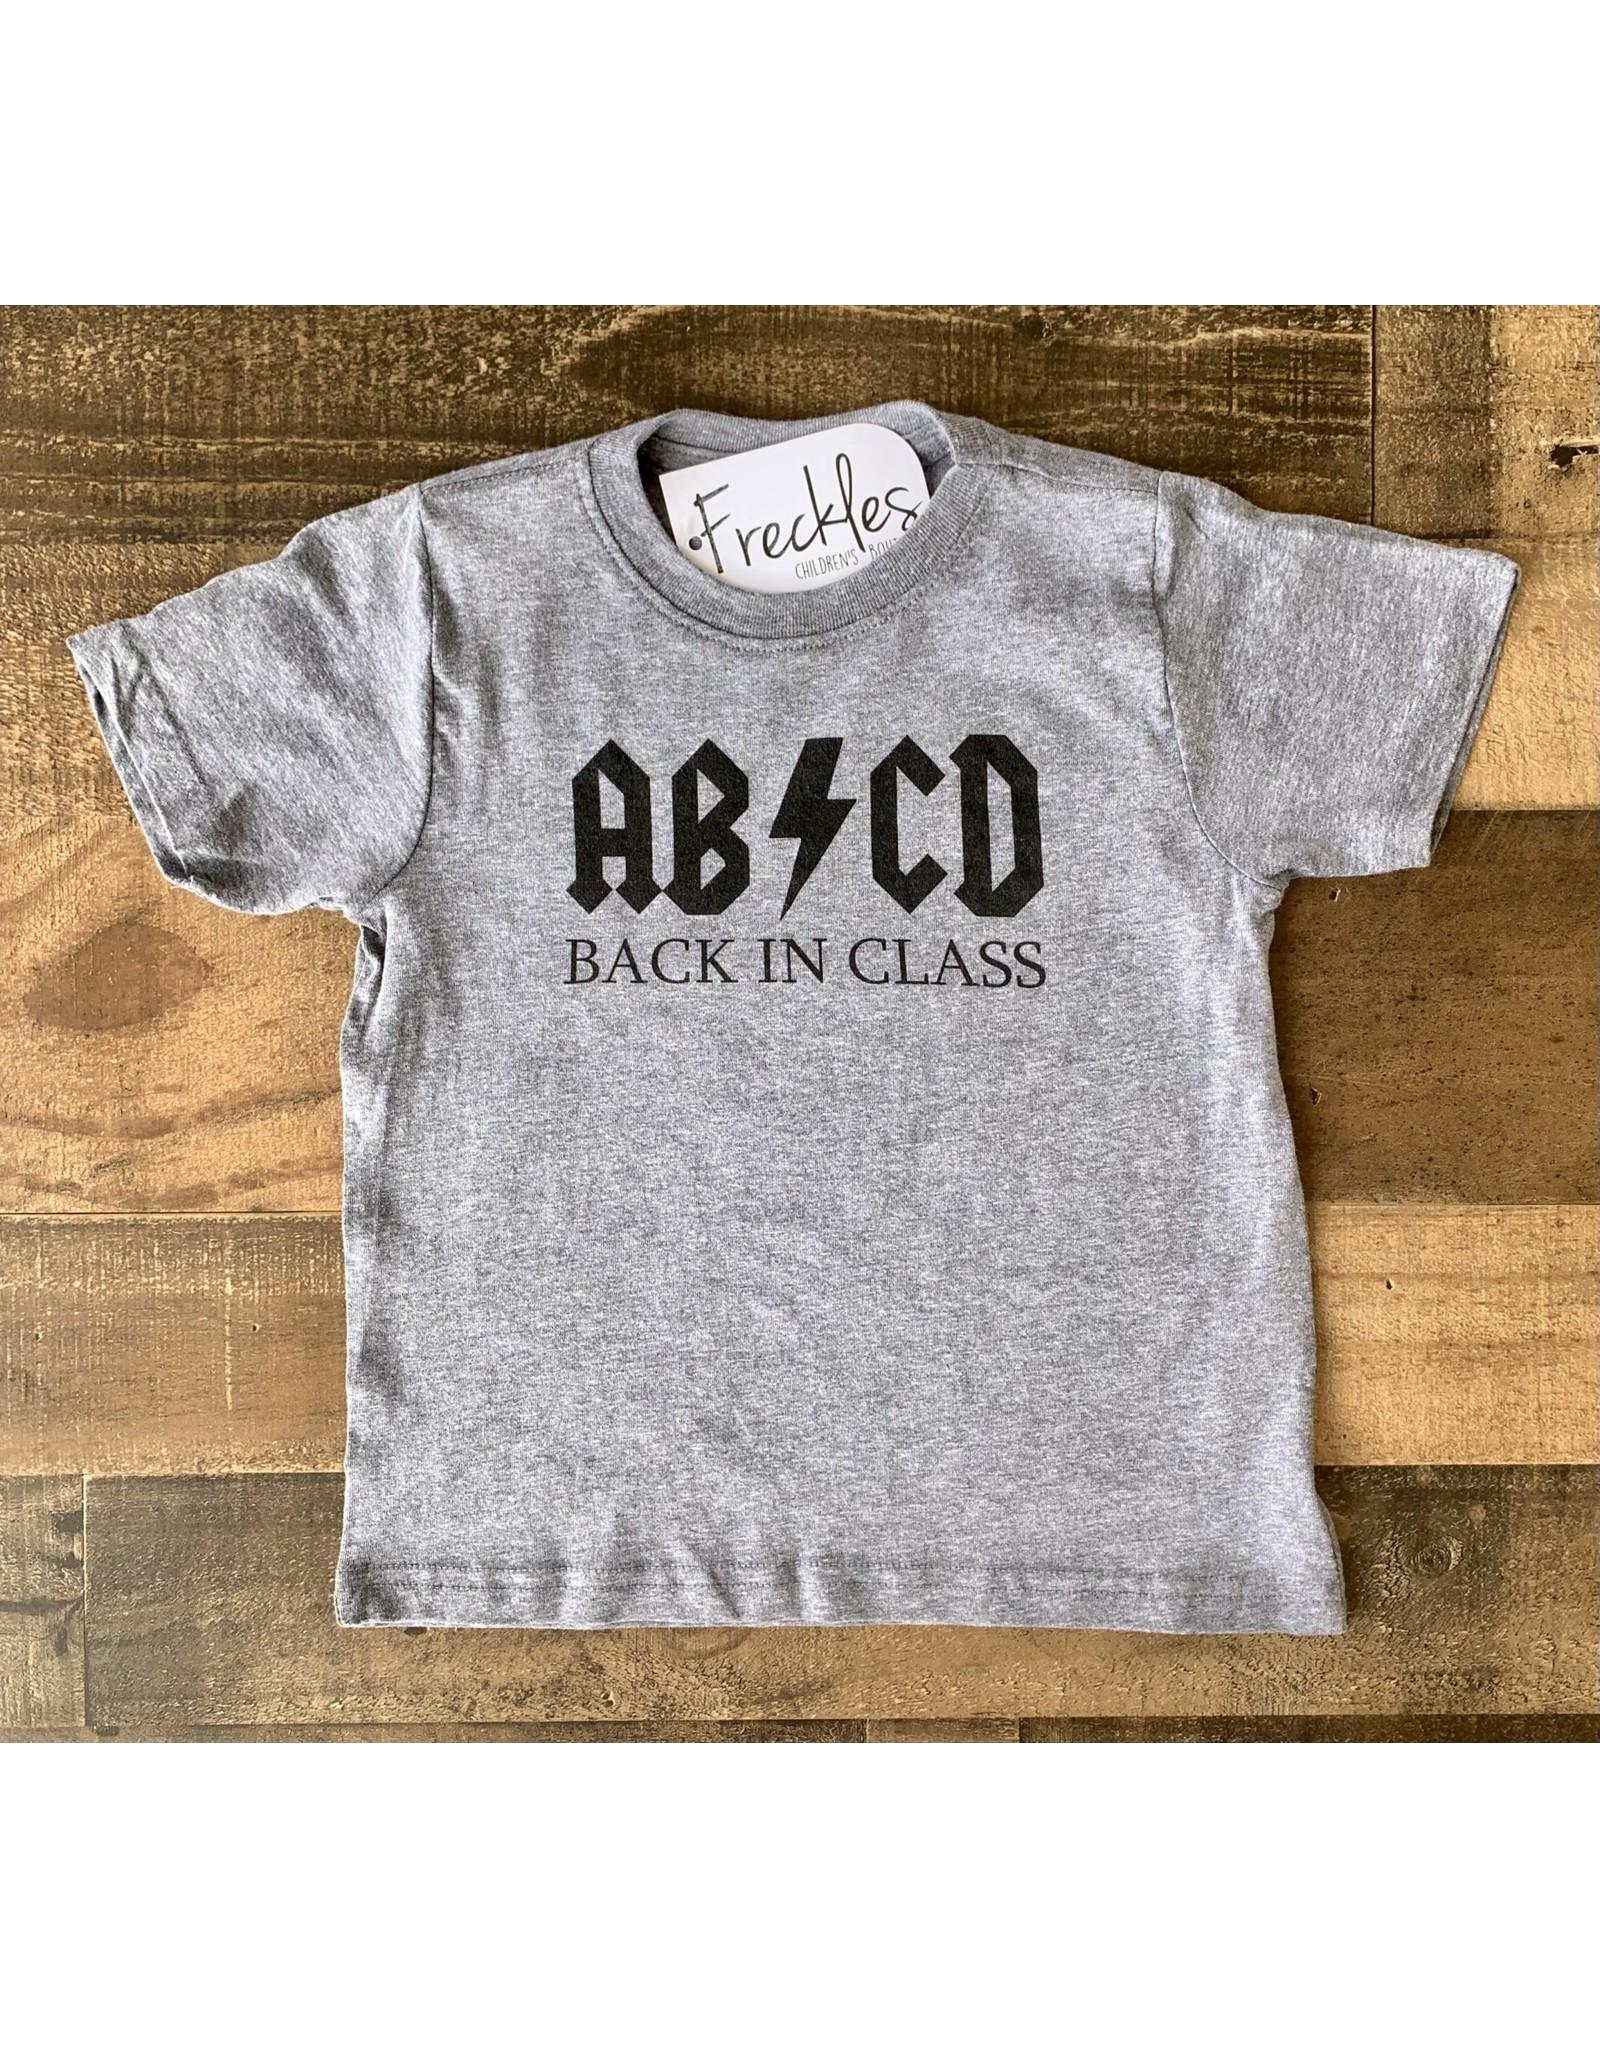 ABCD Back in Class TShirt: Grey